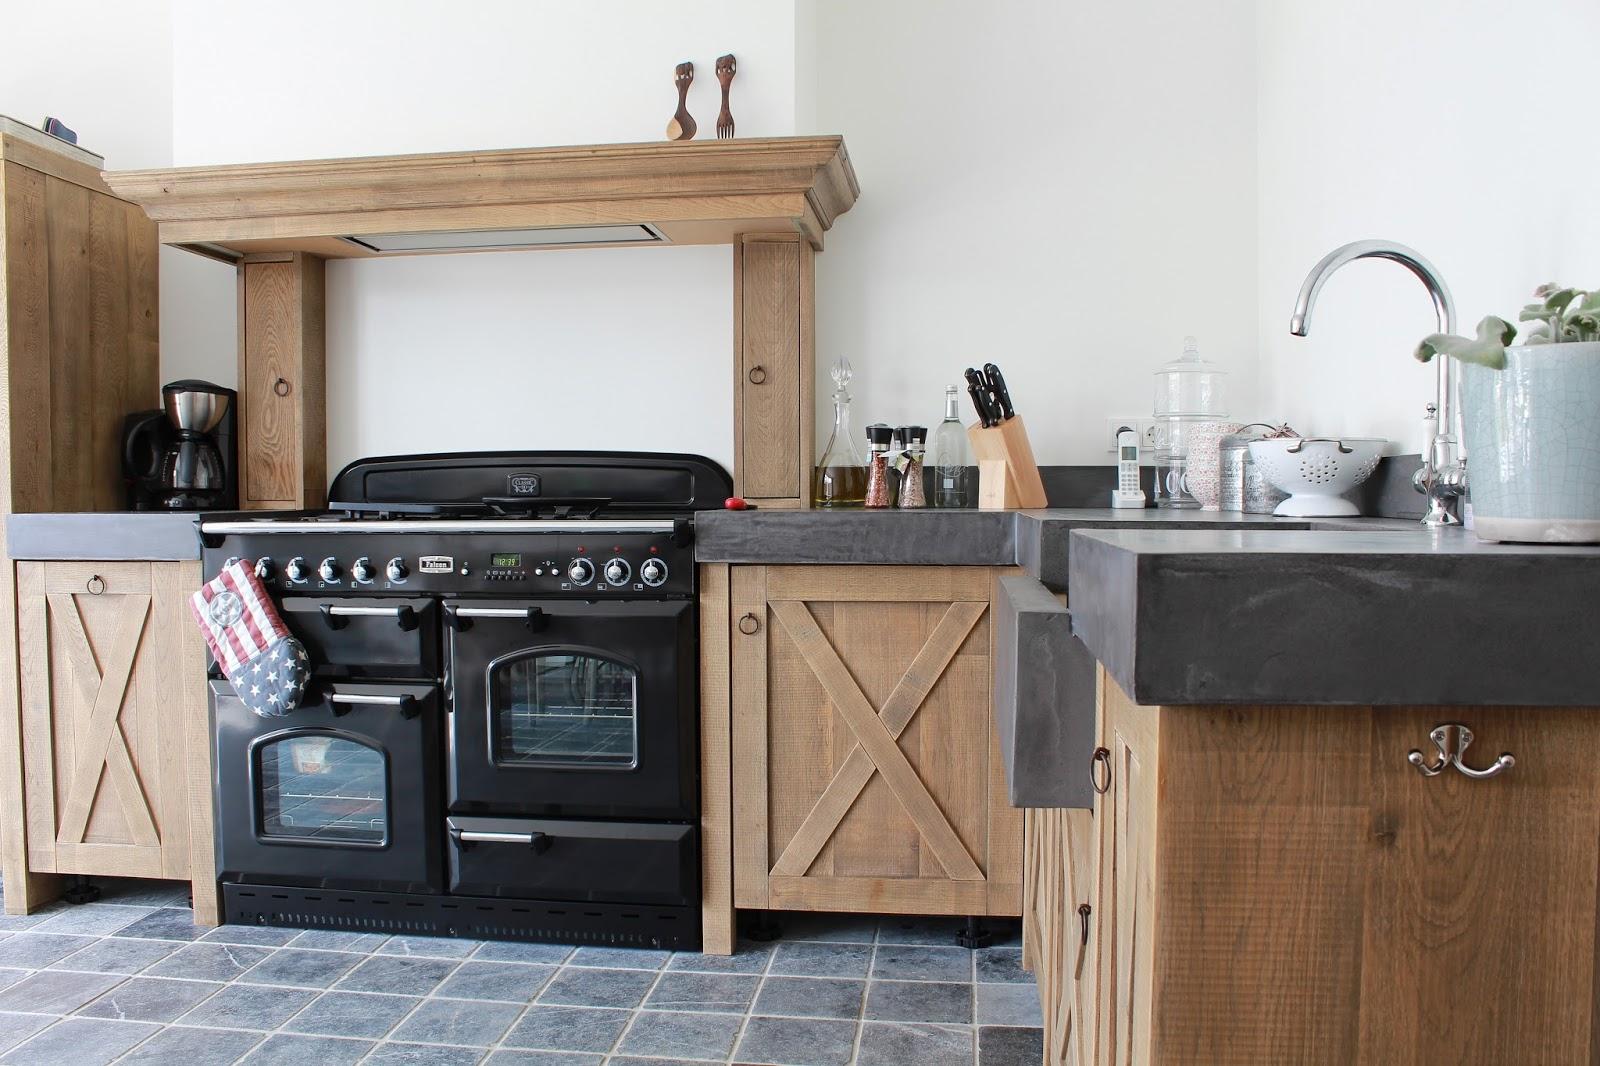 Keuken Steigerhout Kind : Steigerhouten keukens & sloophouten keukens met betonstuc aanrechtblad